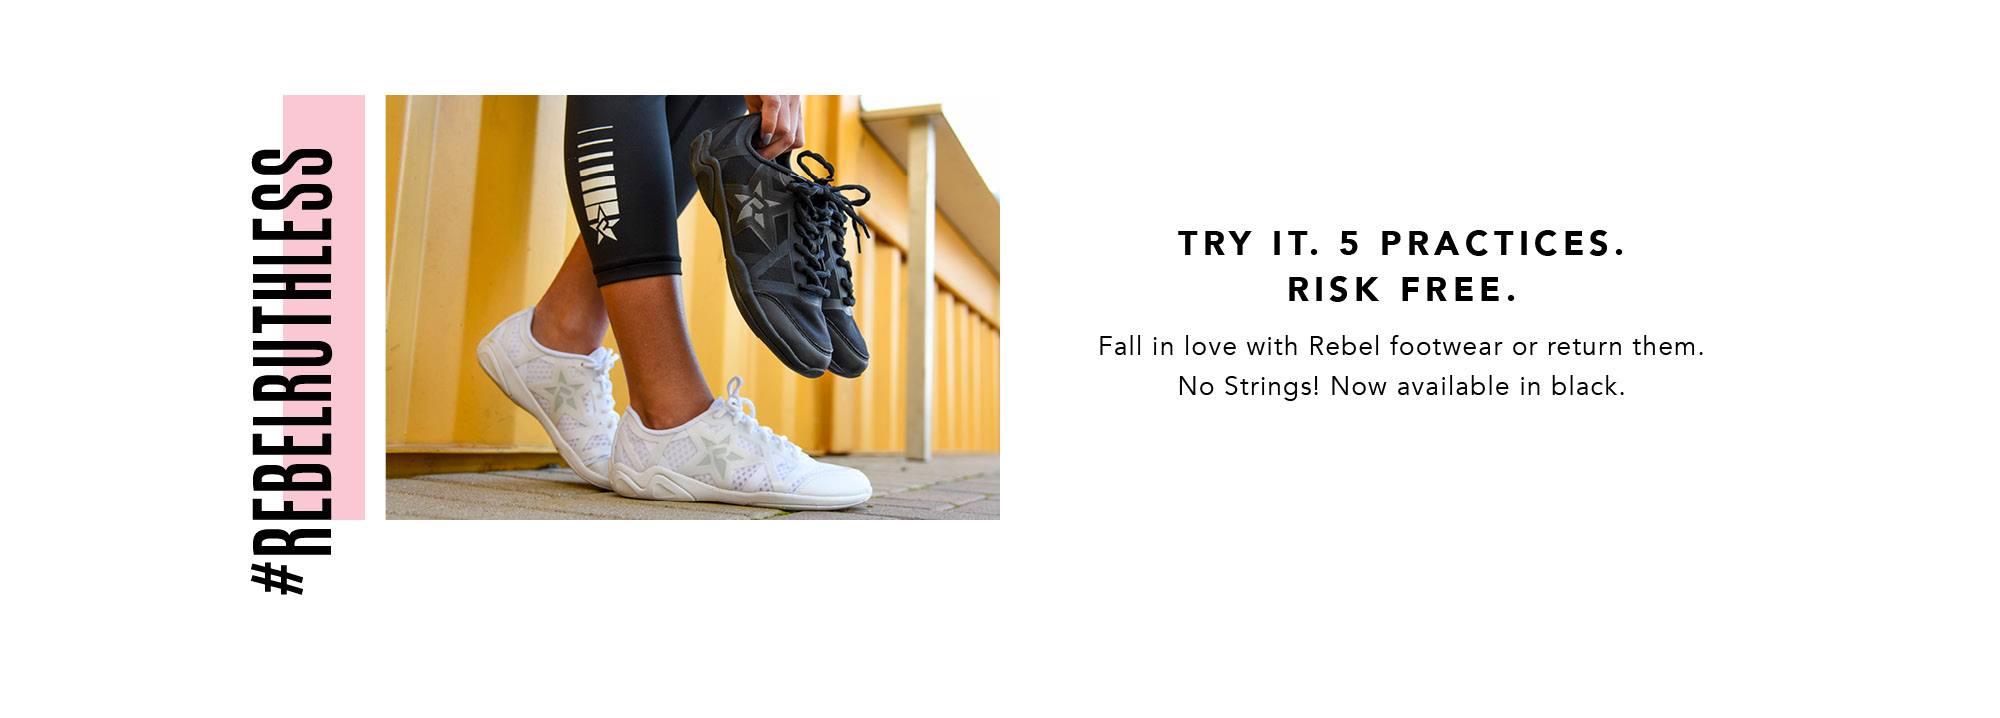 risk free guarantee rebel footwear